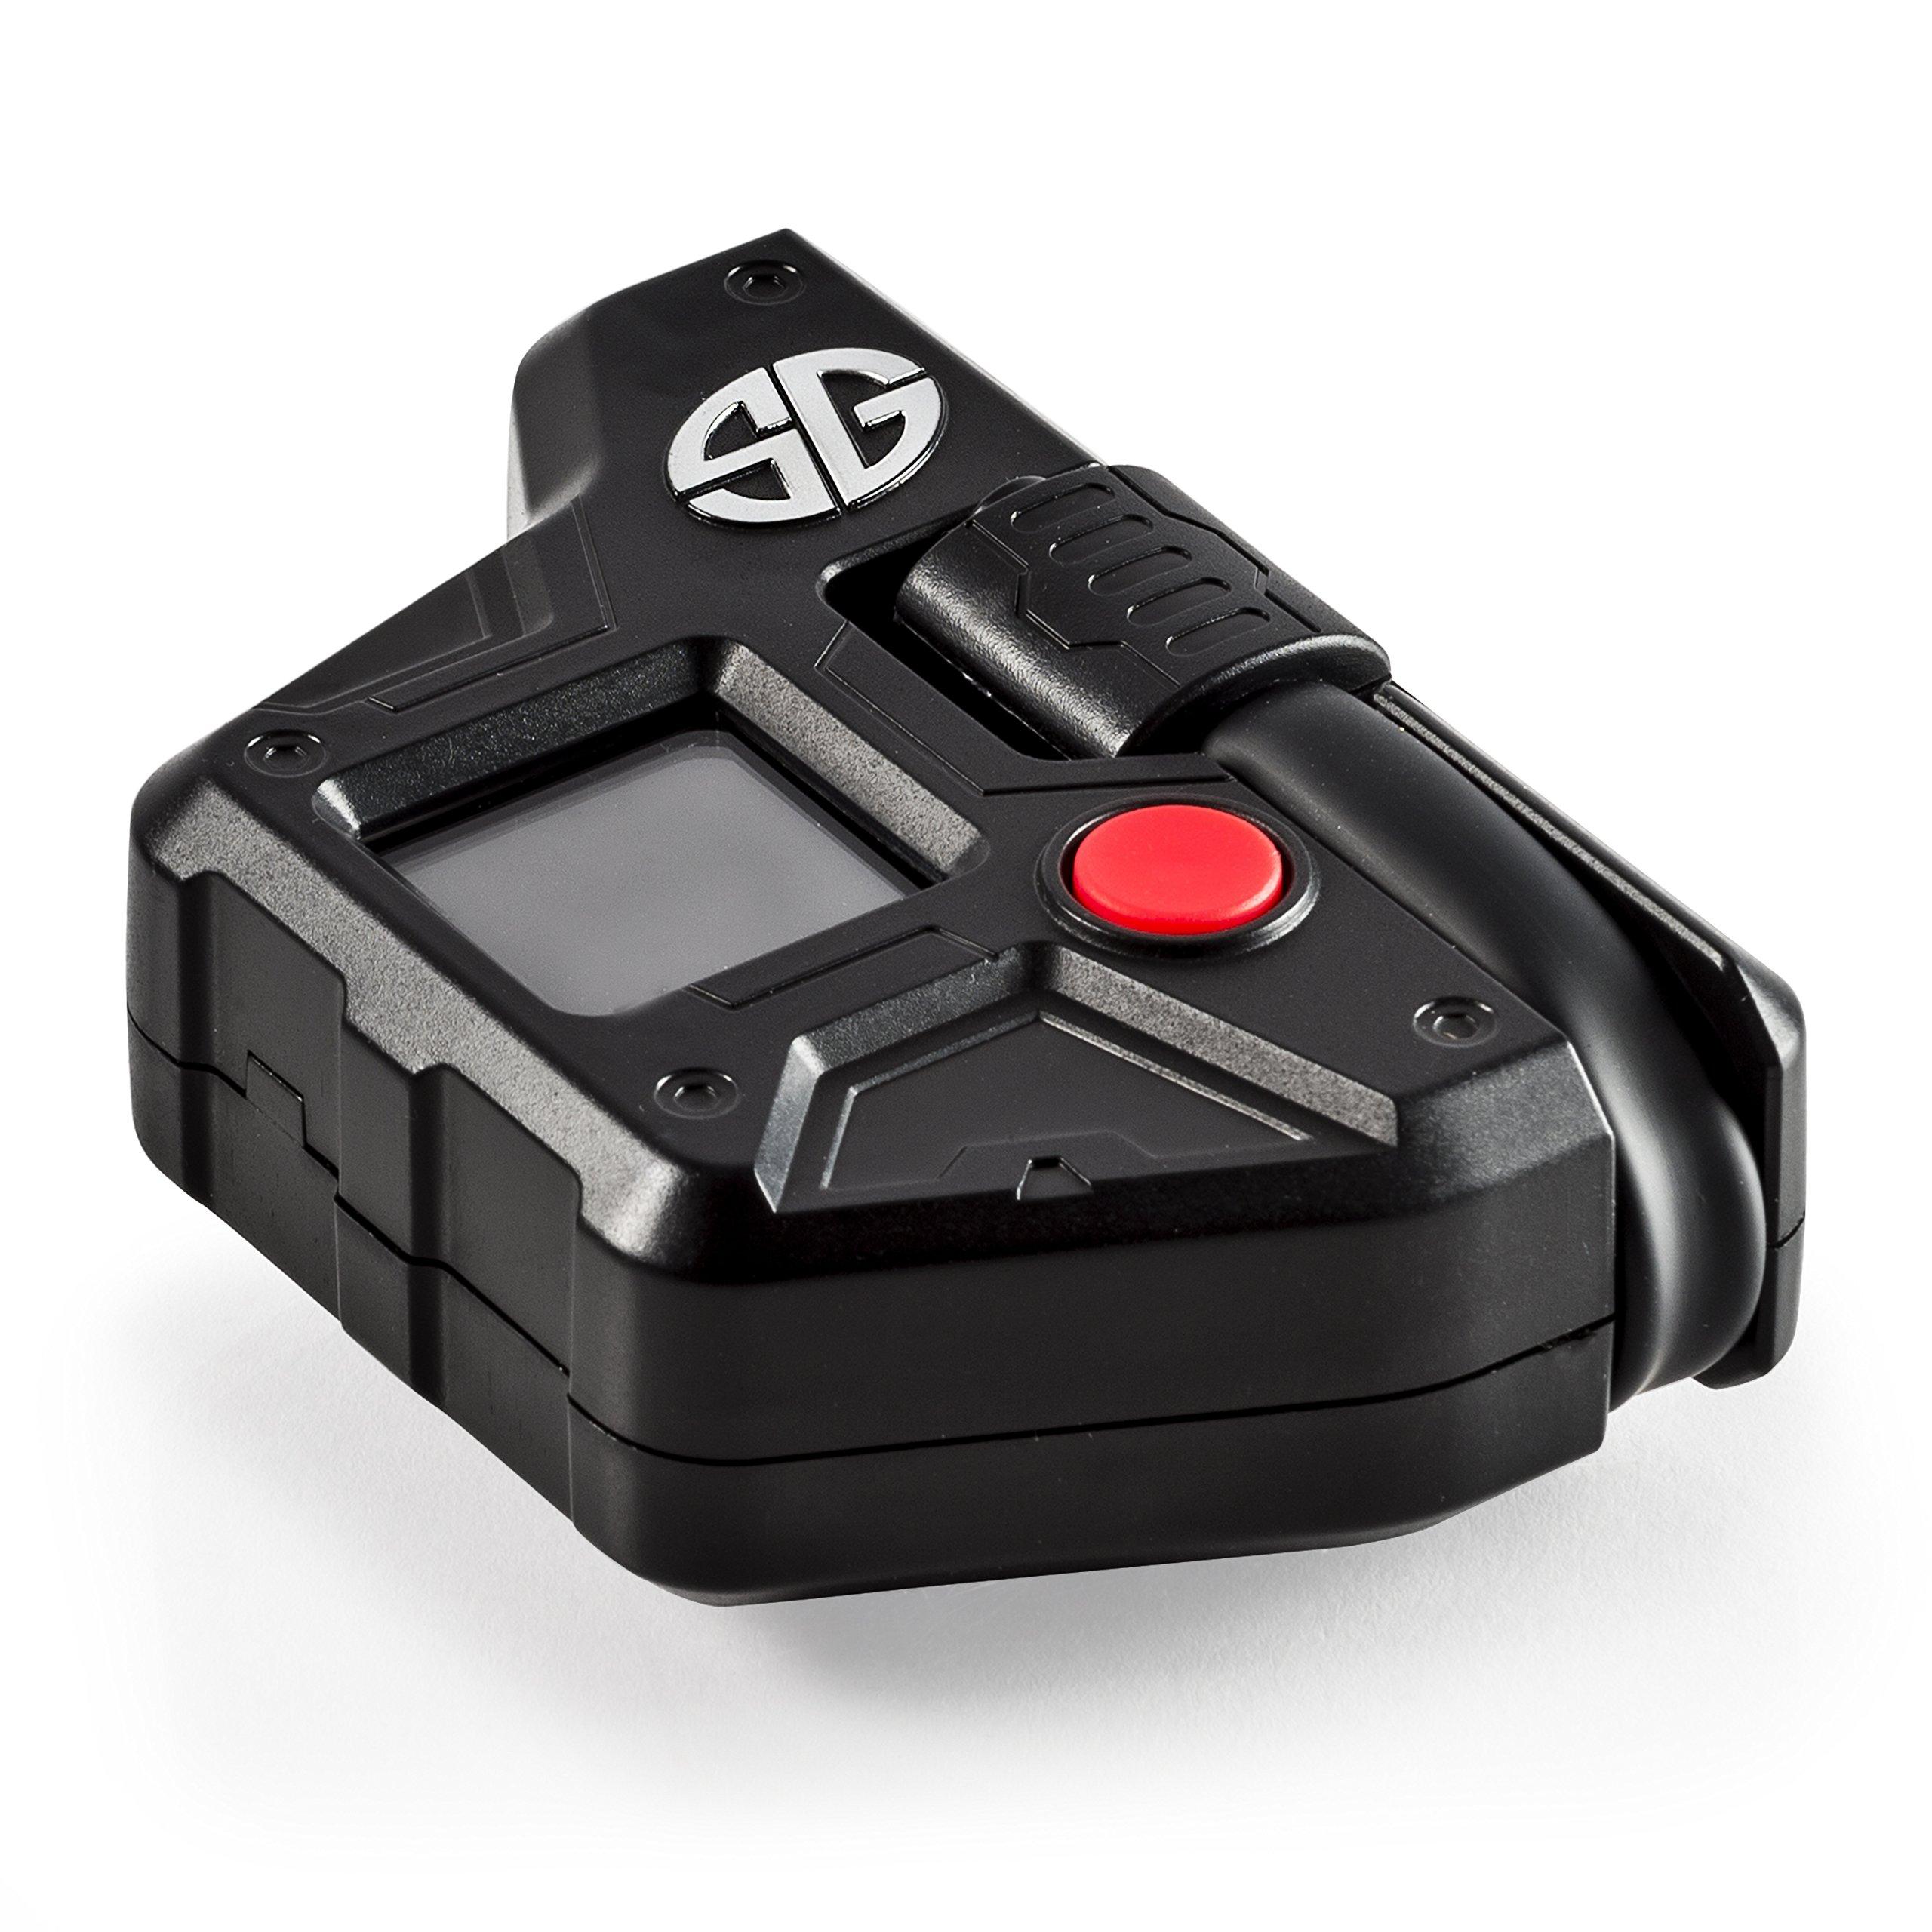 Spy Gear, Spy Snake Cam by Spy Gear (Image #4)